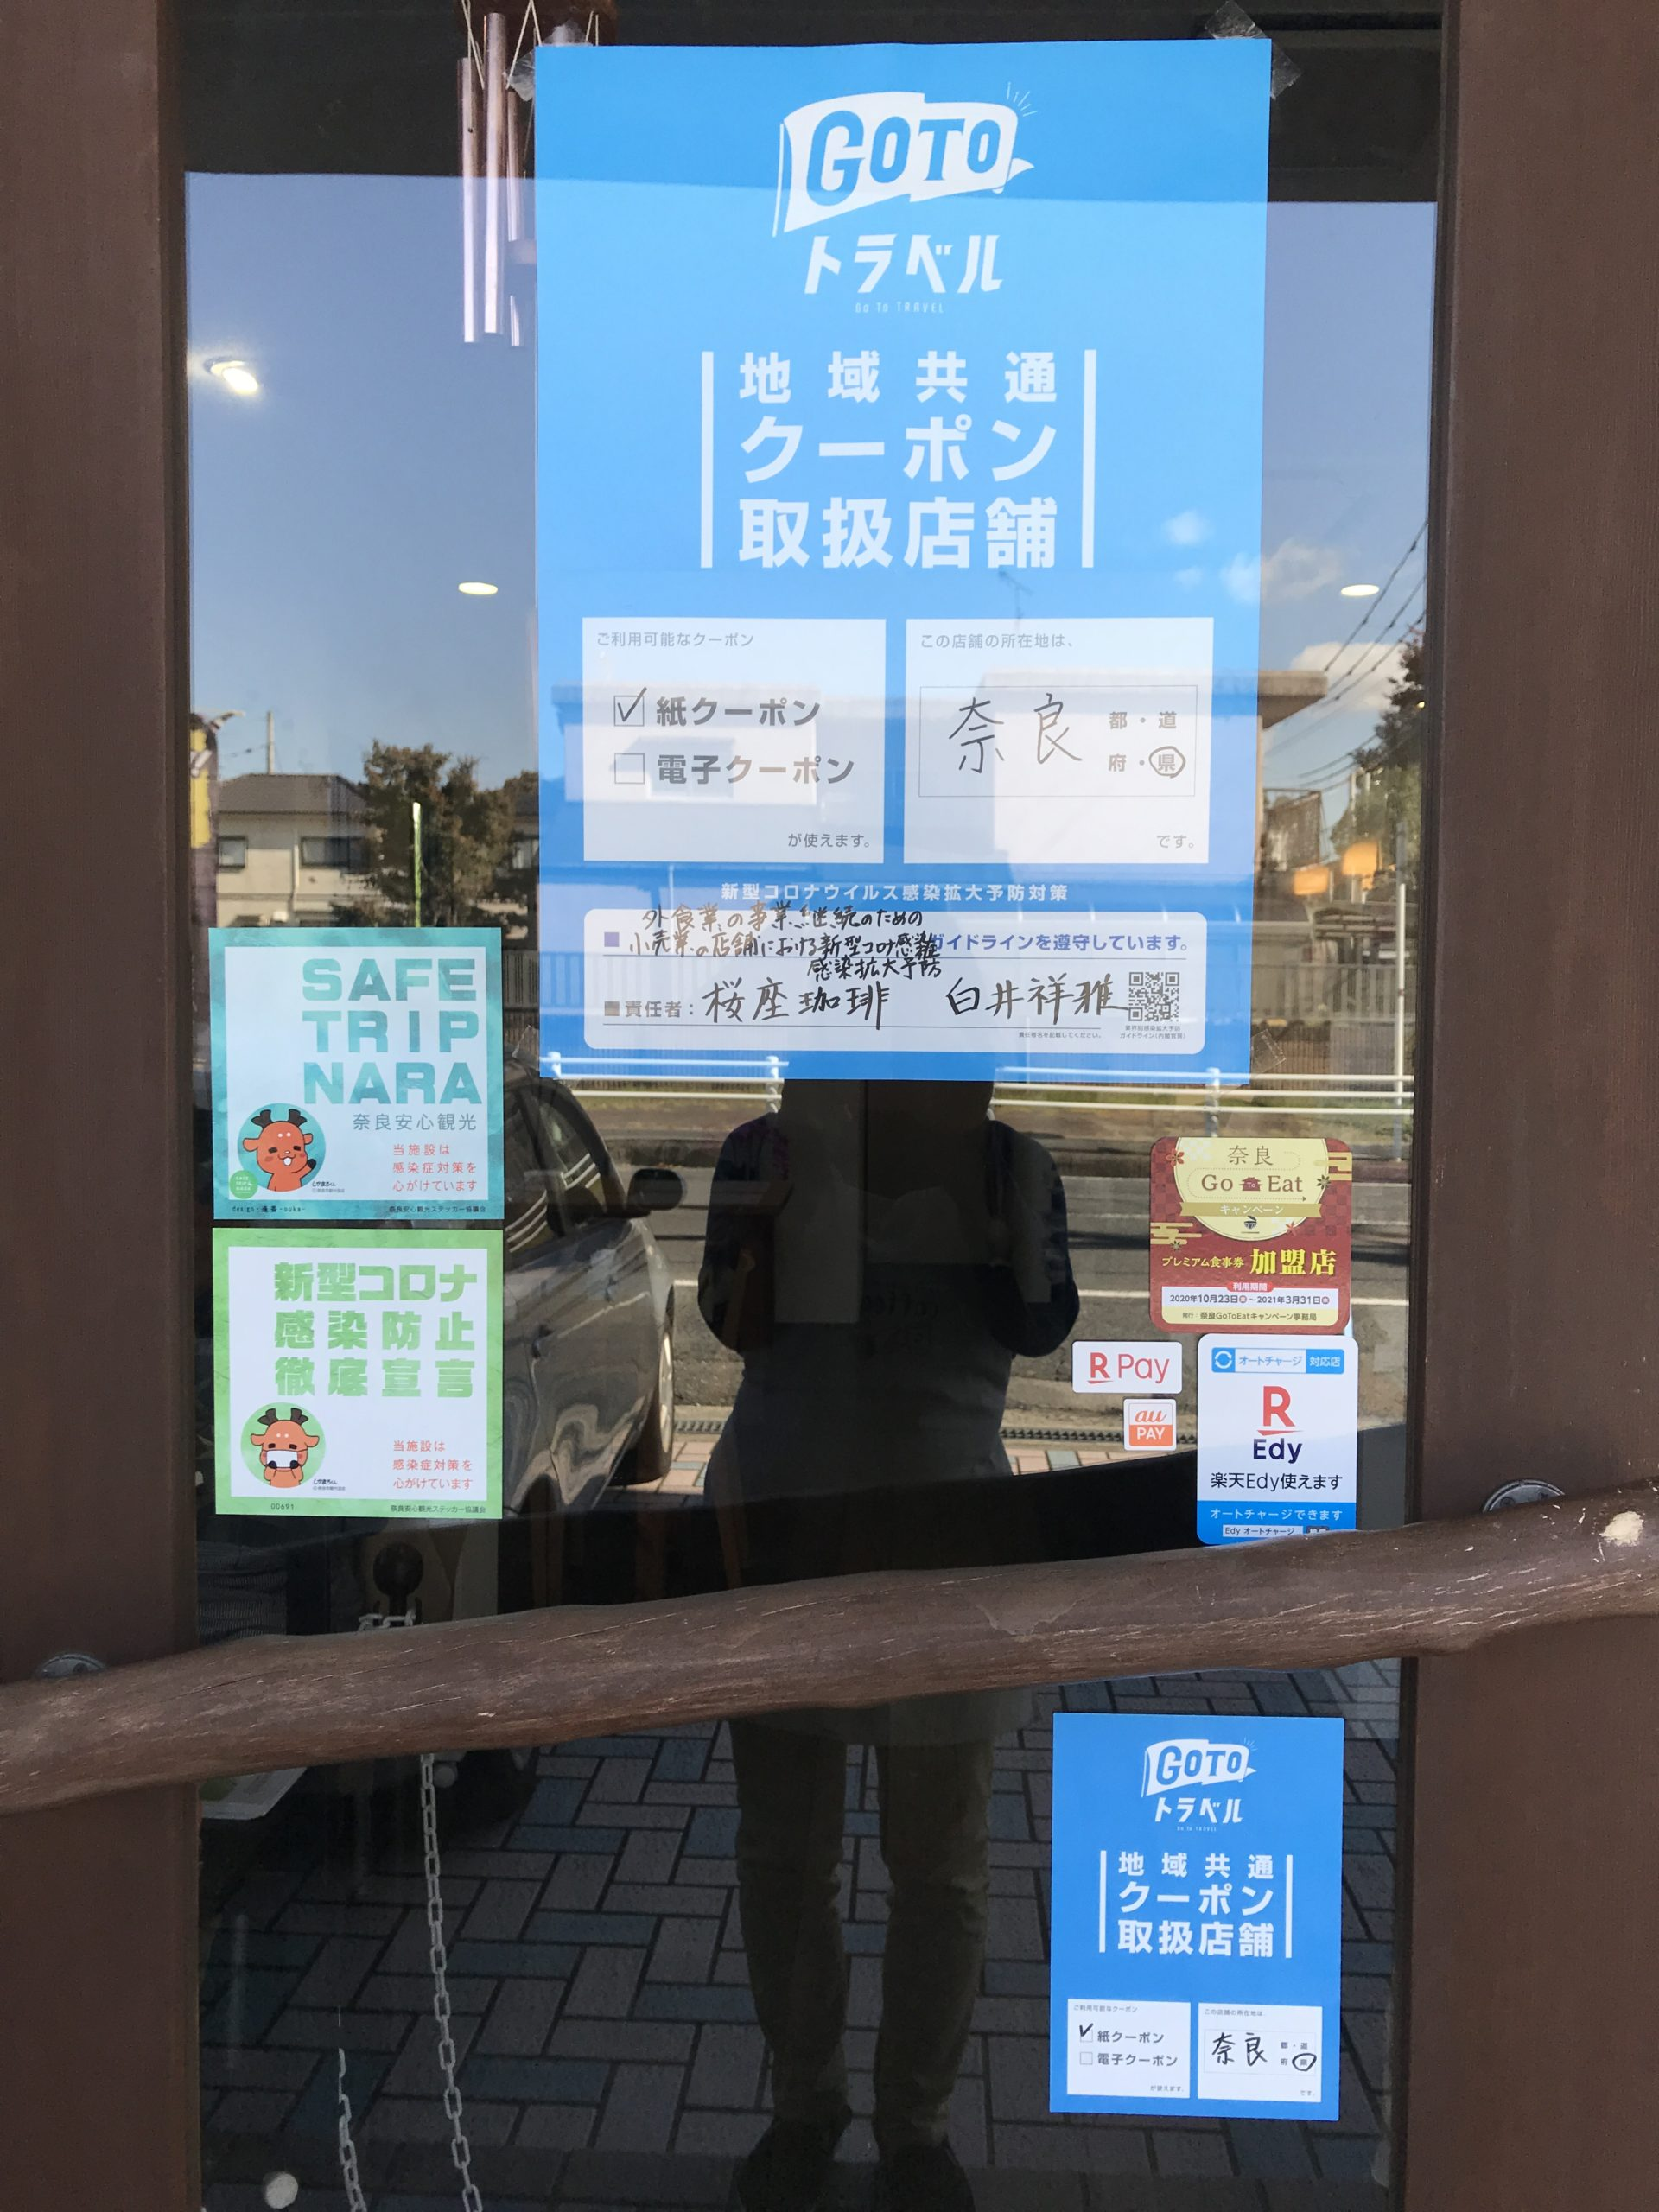 Gotoトラベル地域共通クーポン取扱店